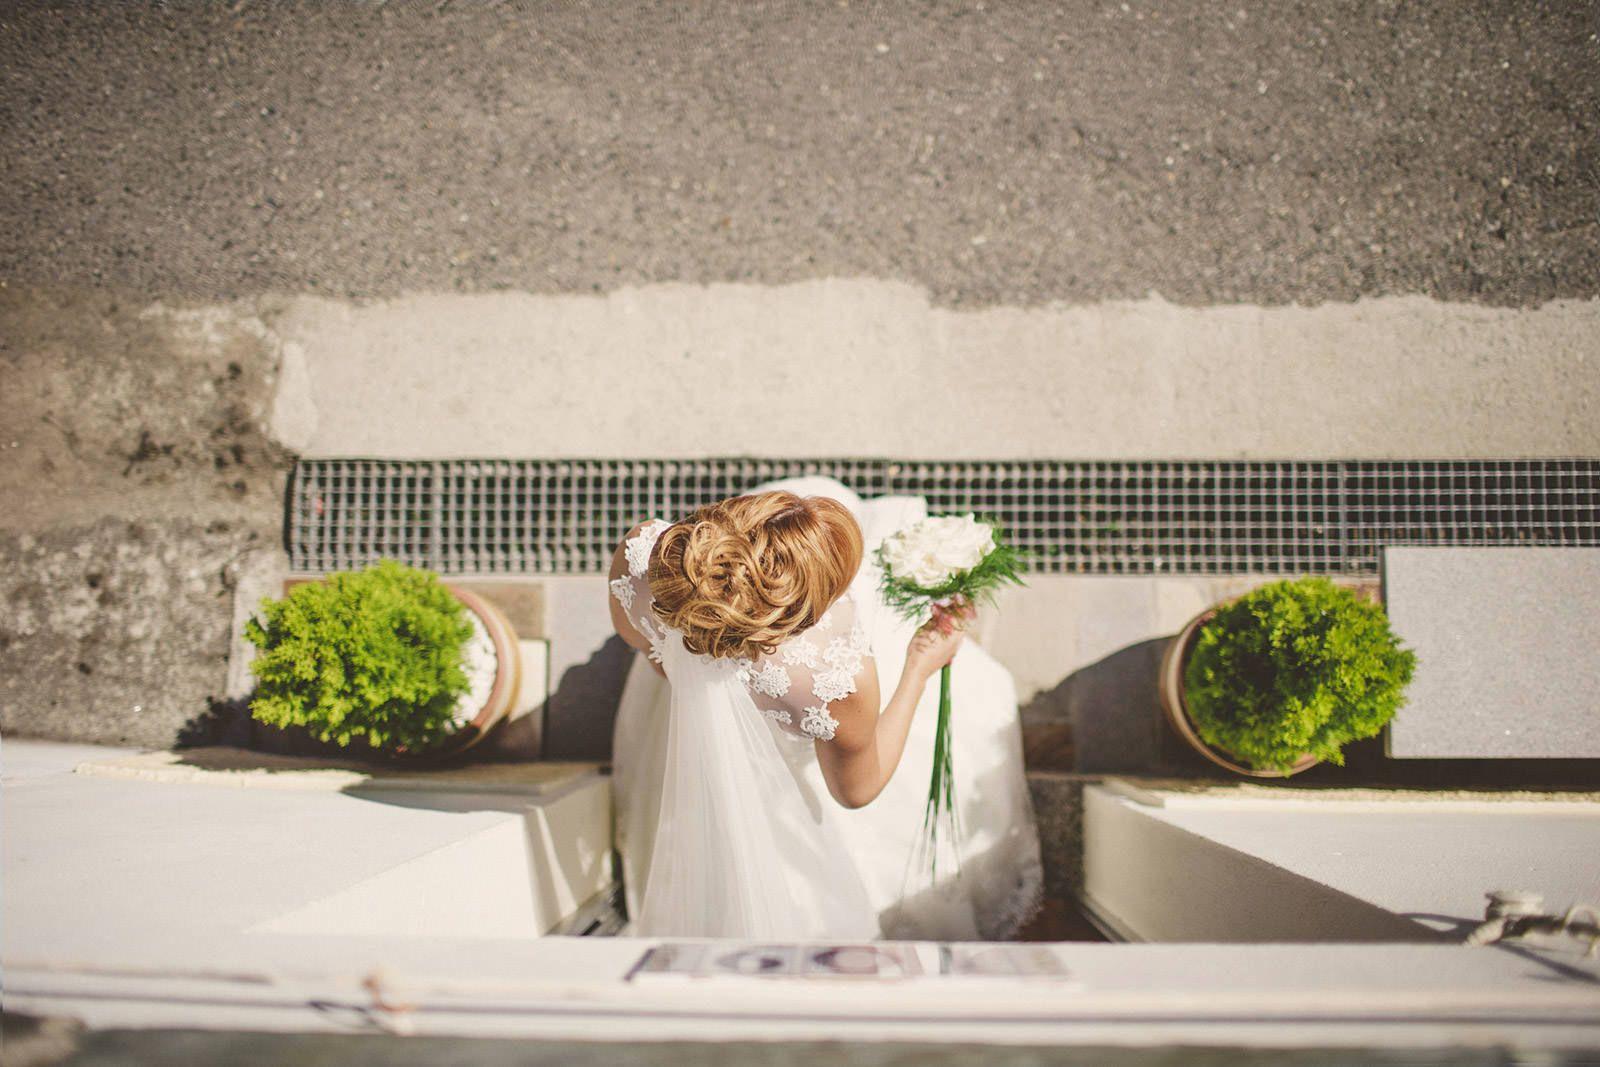 Fotografias originales de boda en Valencia - Santi Miquel - Fotografo de boda - 001